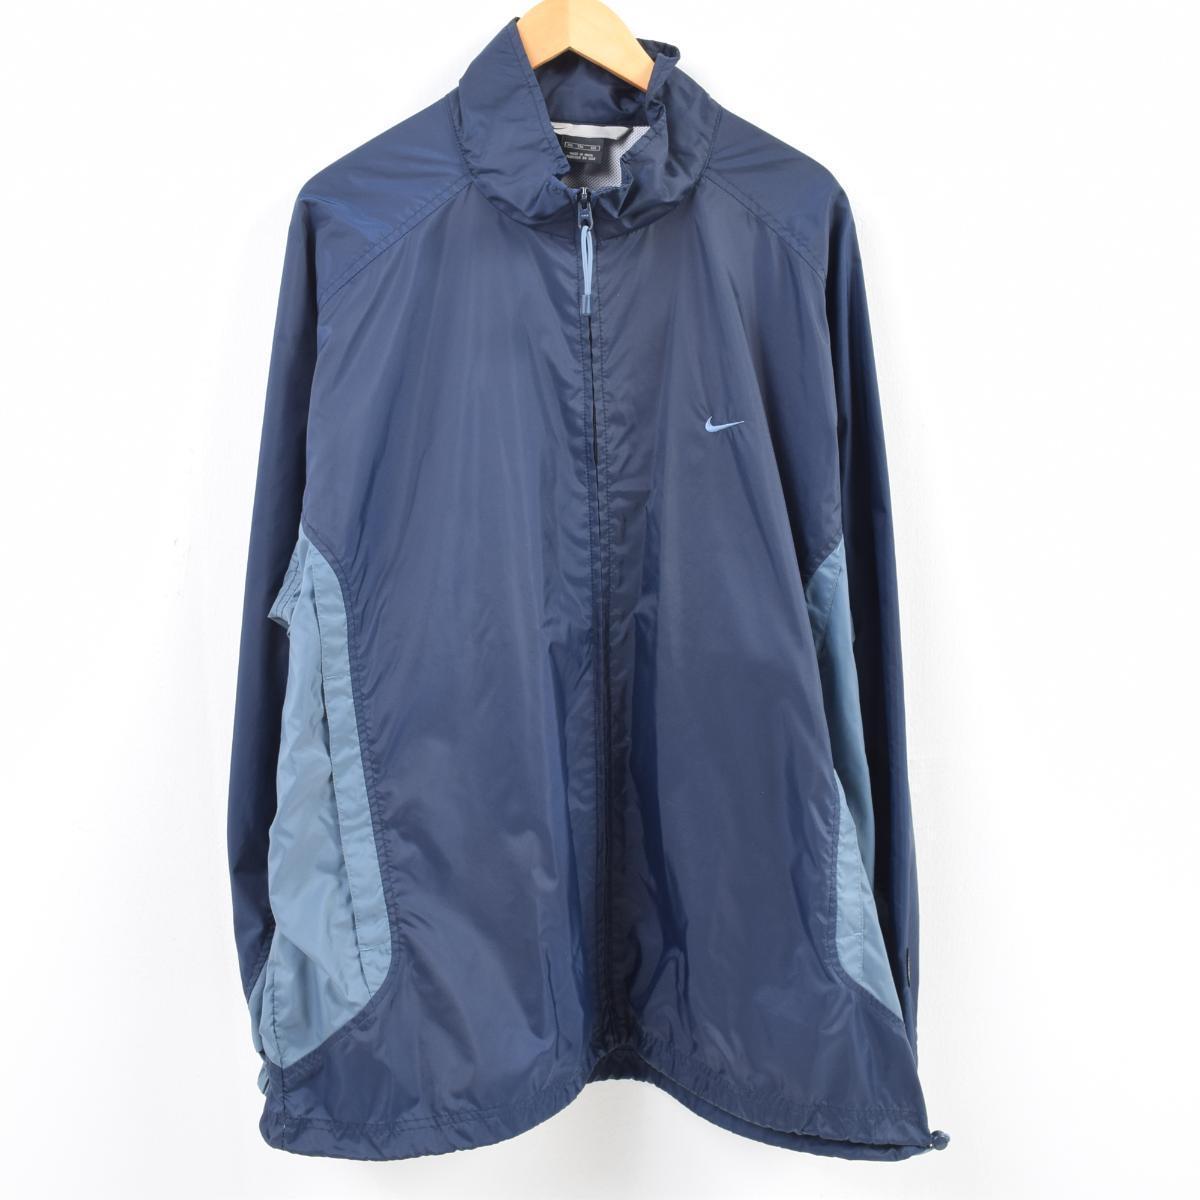 1ca9ea3410 VINTAGE CLOTHING JAM  Nike NIKE nylon jacket men XXL  waq0522 ...